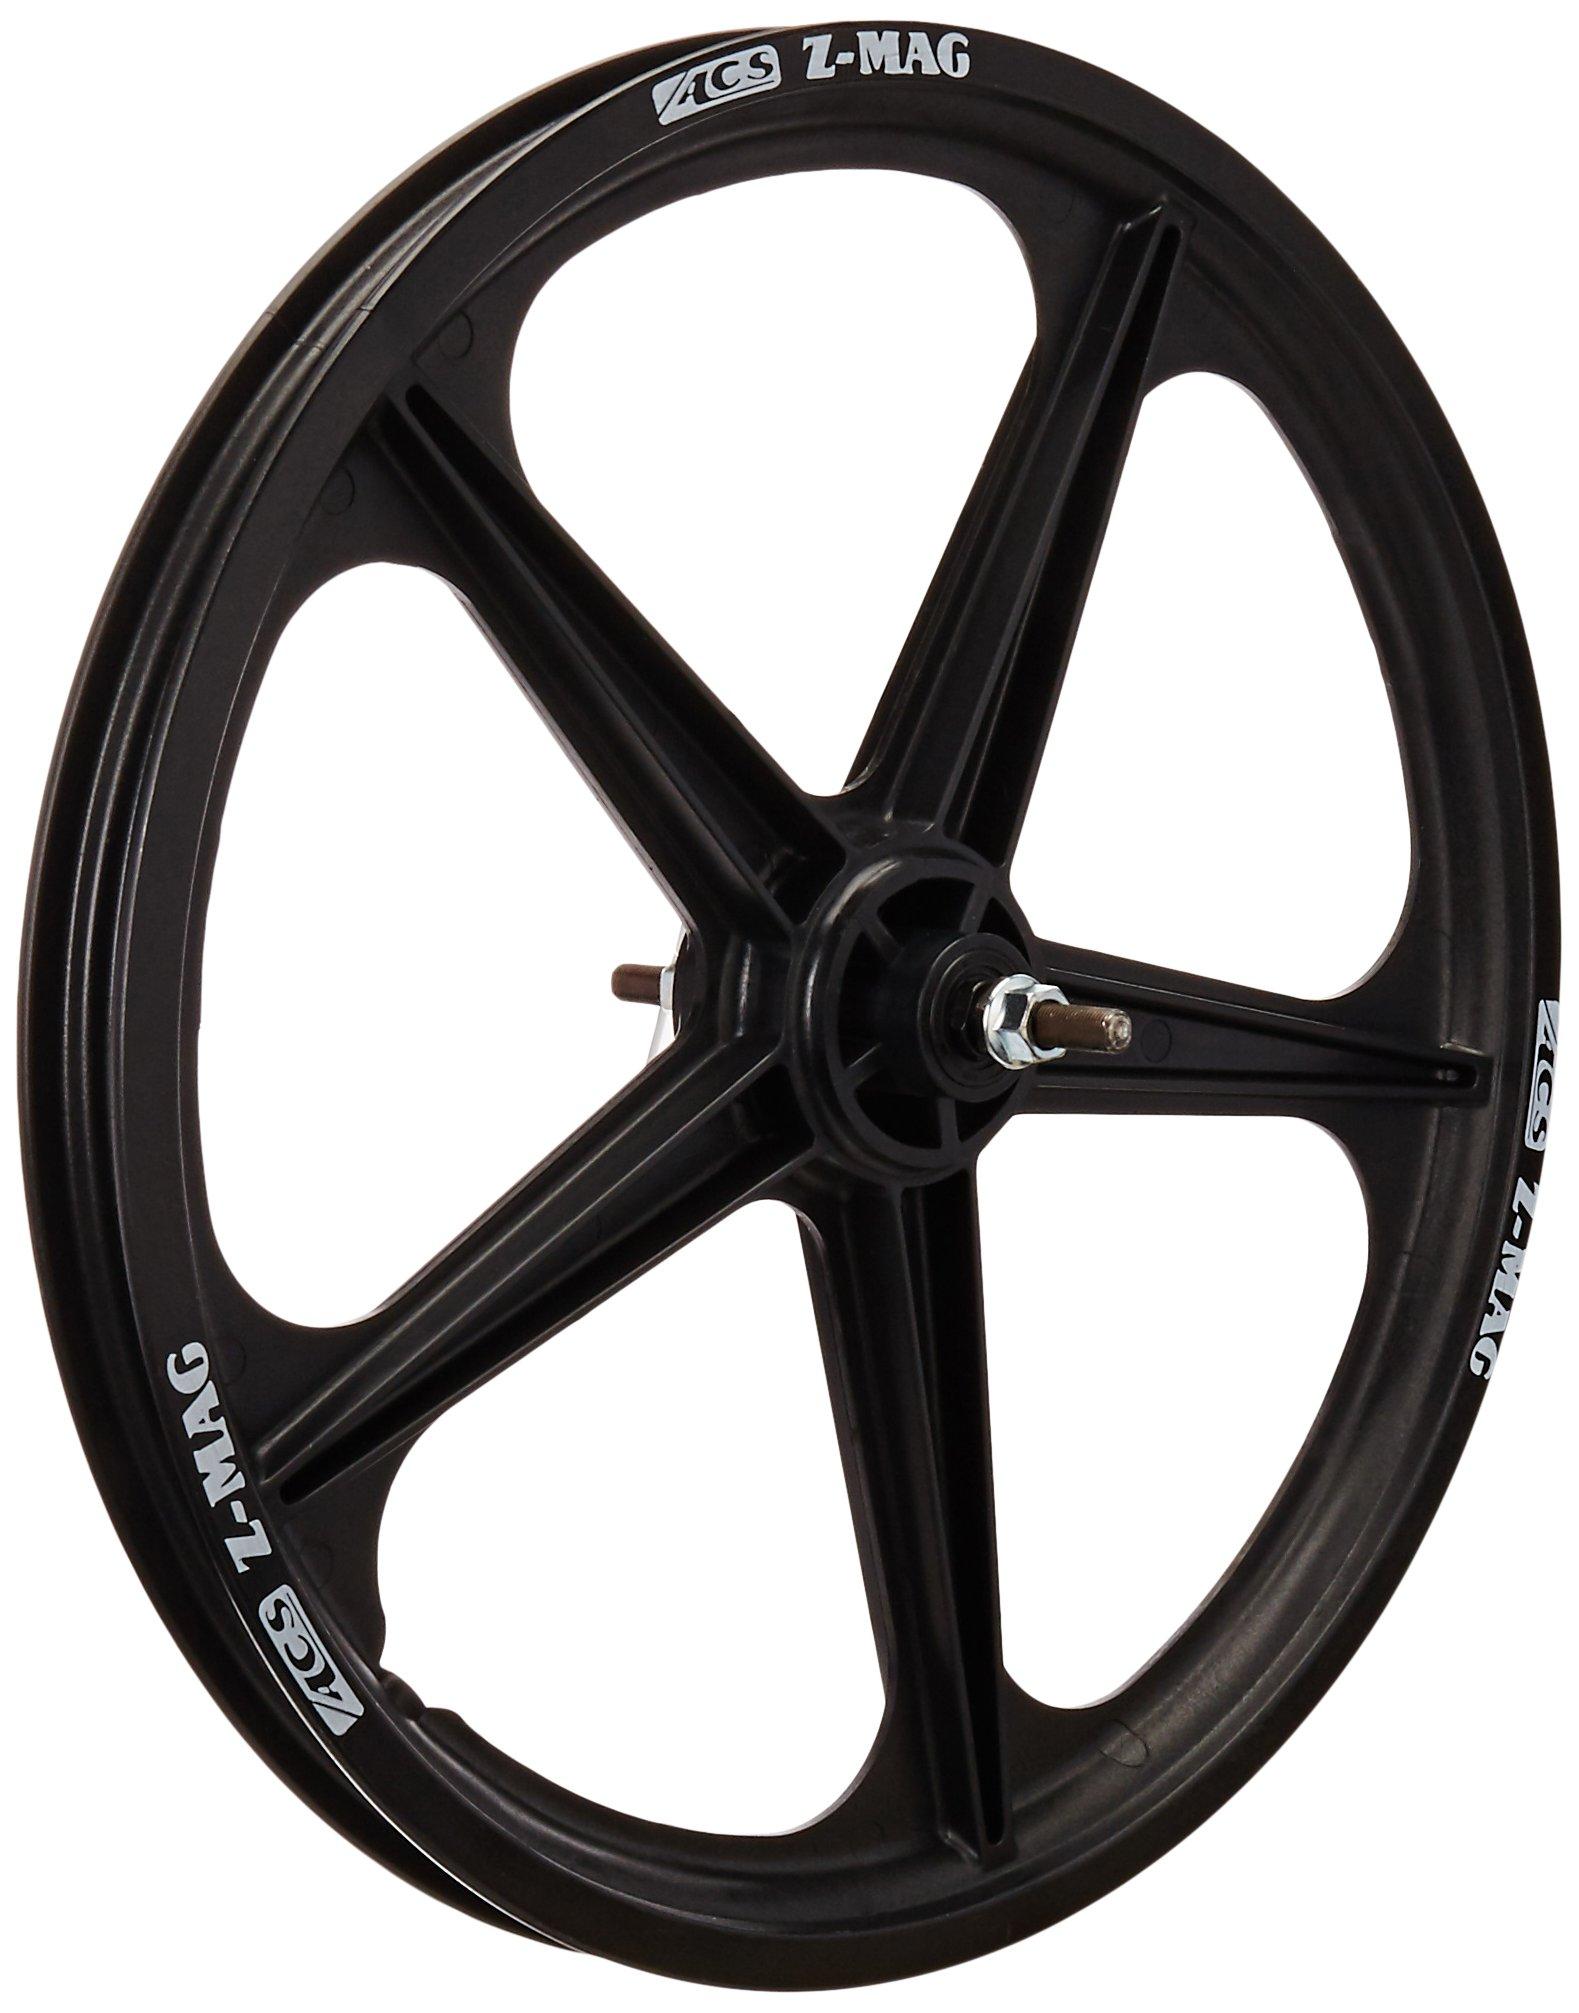 ACS Mag 5-Spoke Front Wheel, Black